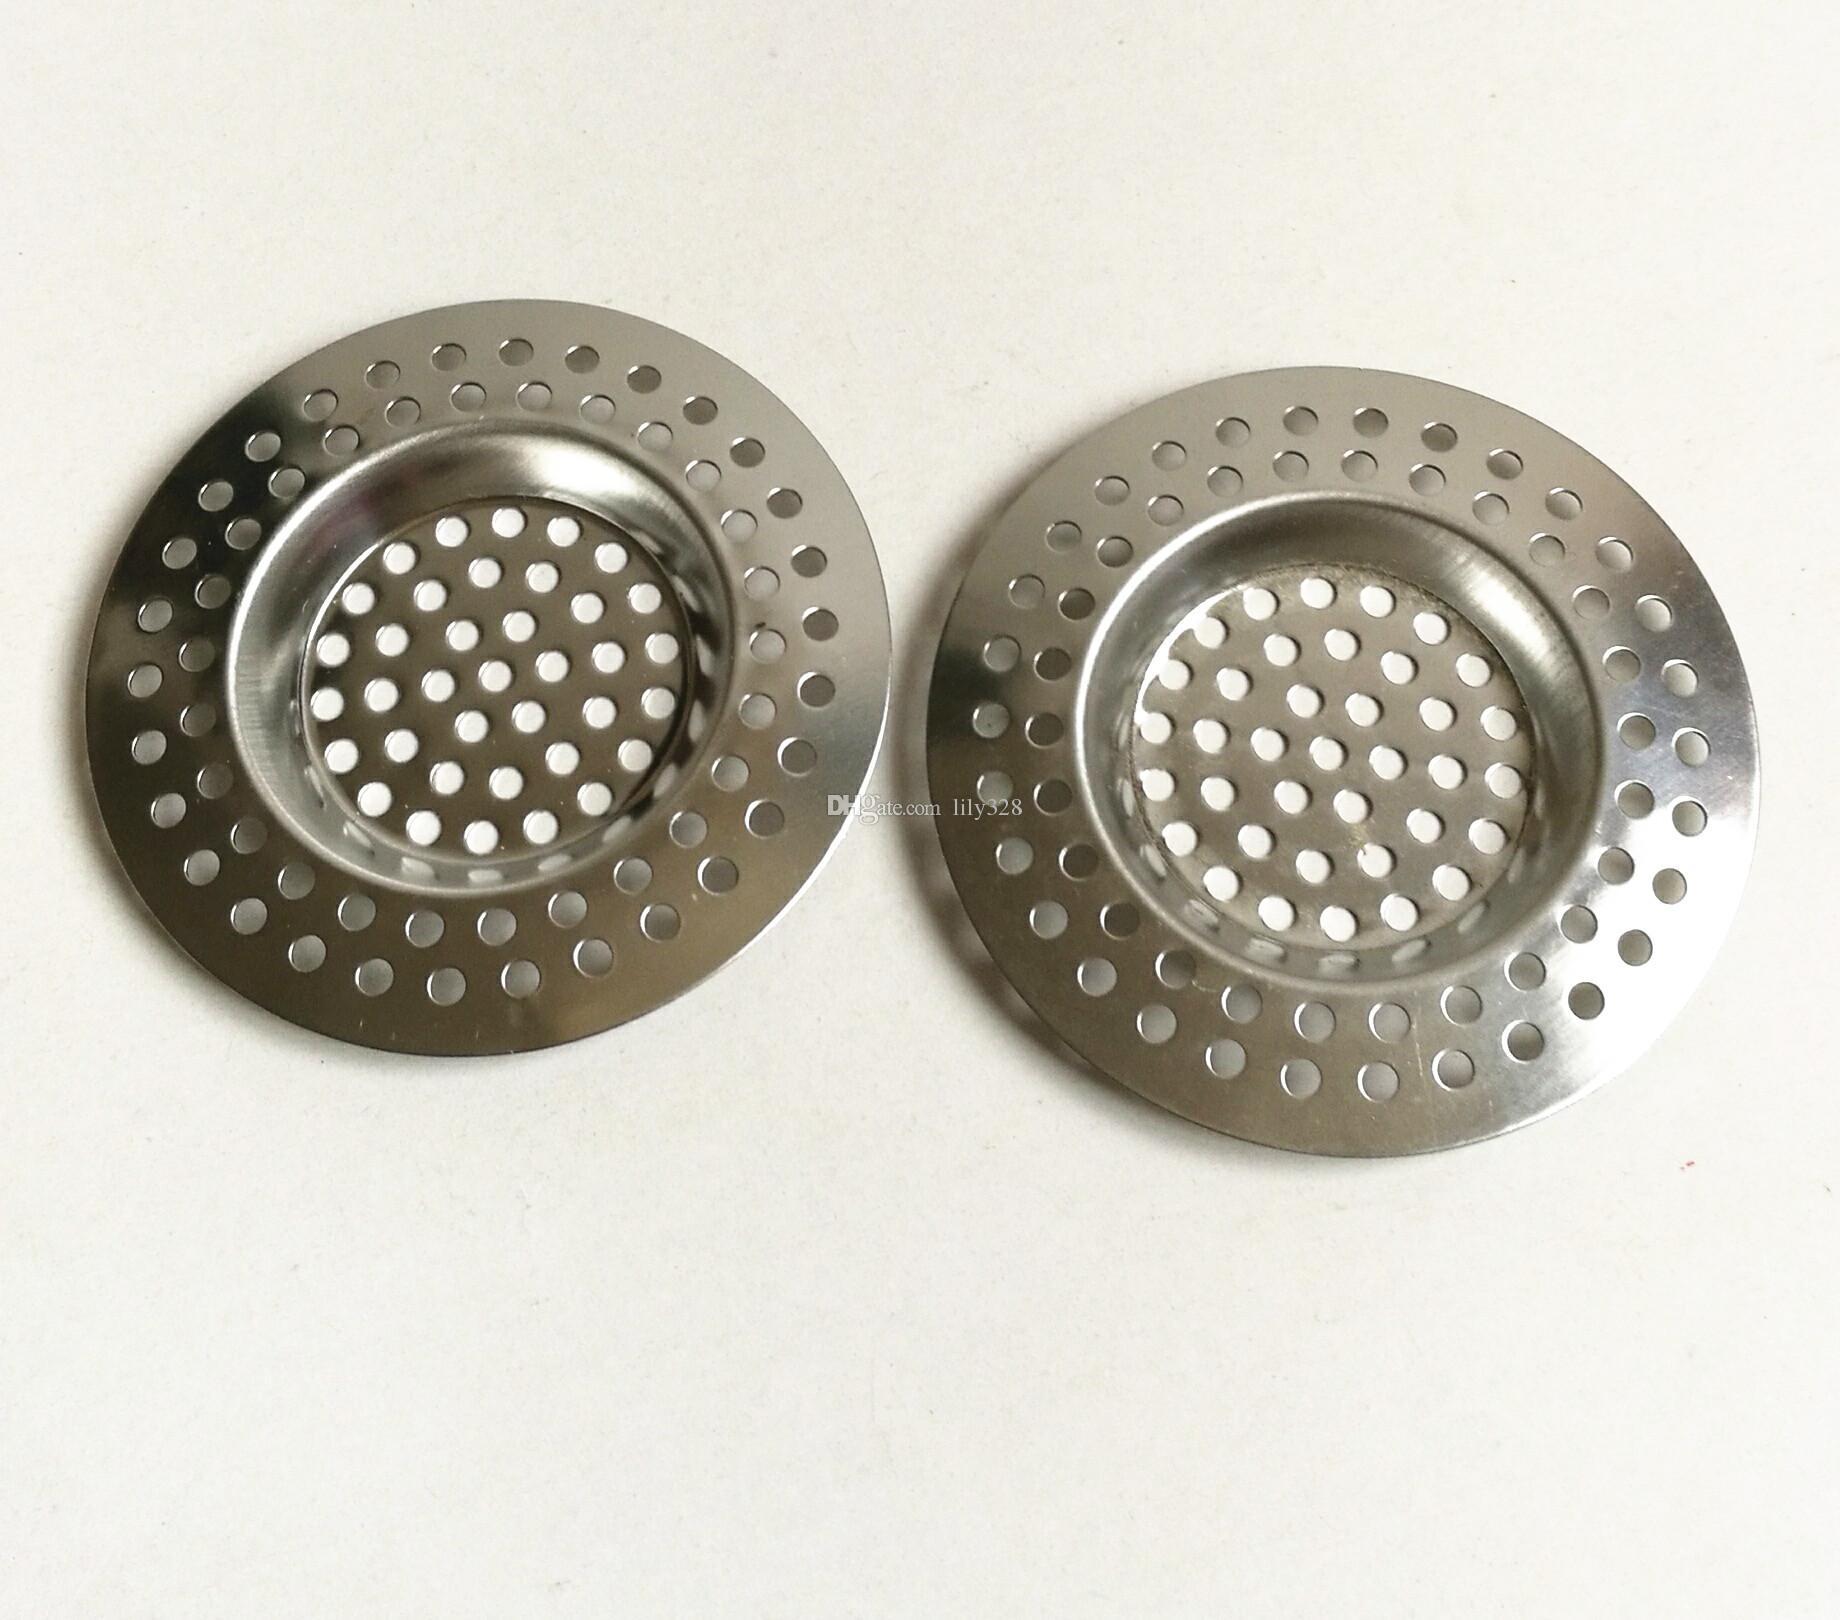 7.5 cm Stainless Steel Round Floor Drain Kitchen Sink Filter Sewer Drain Hair Colanders & Strainers Filter Bathroom